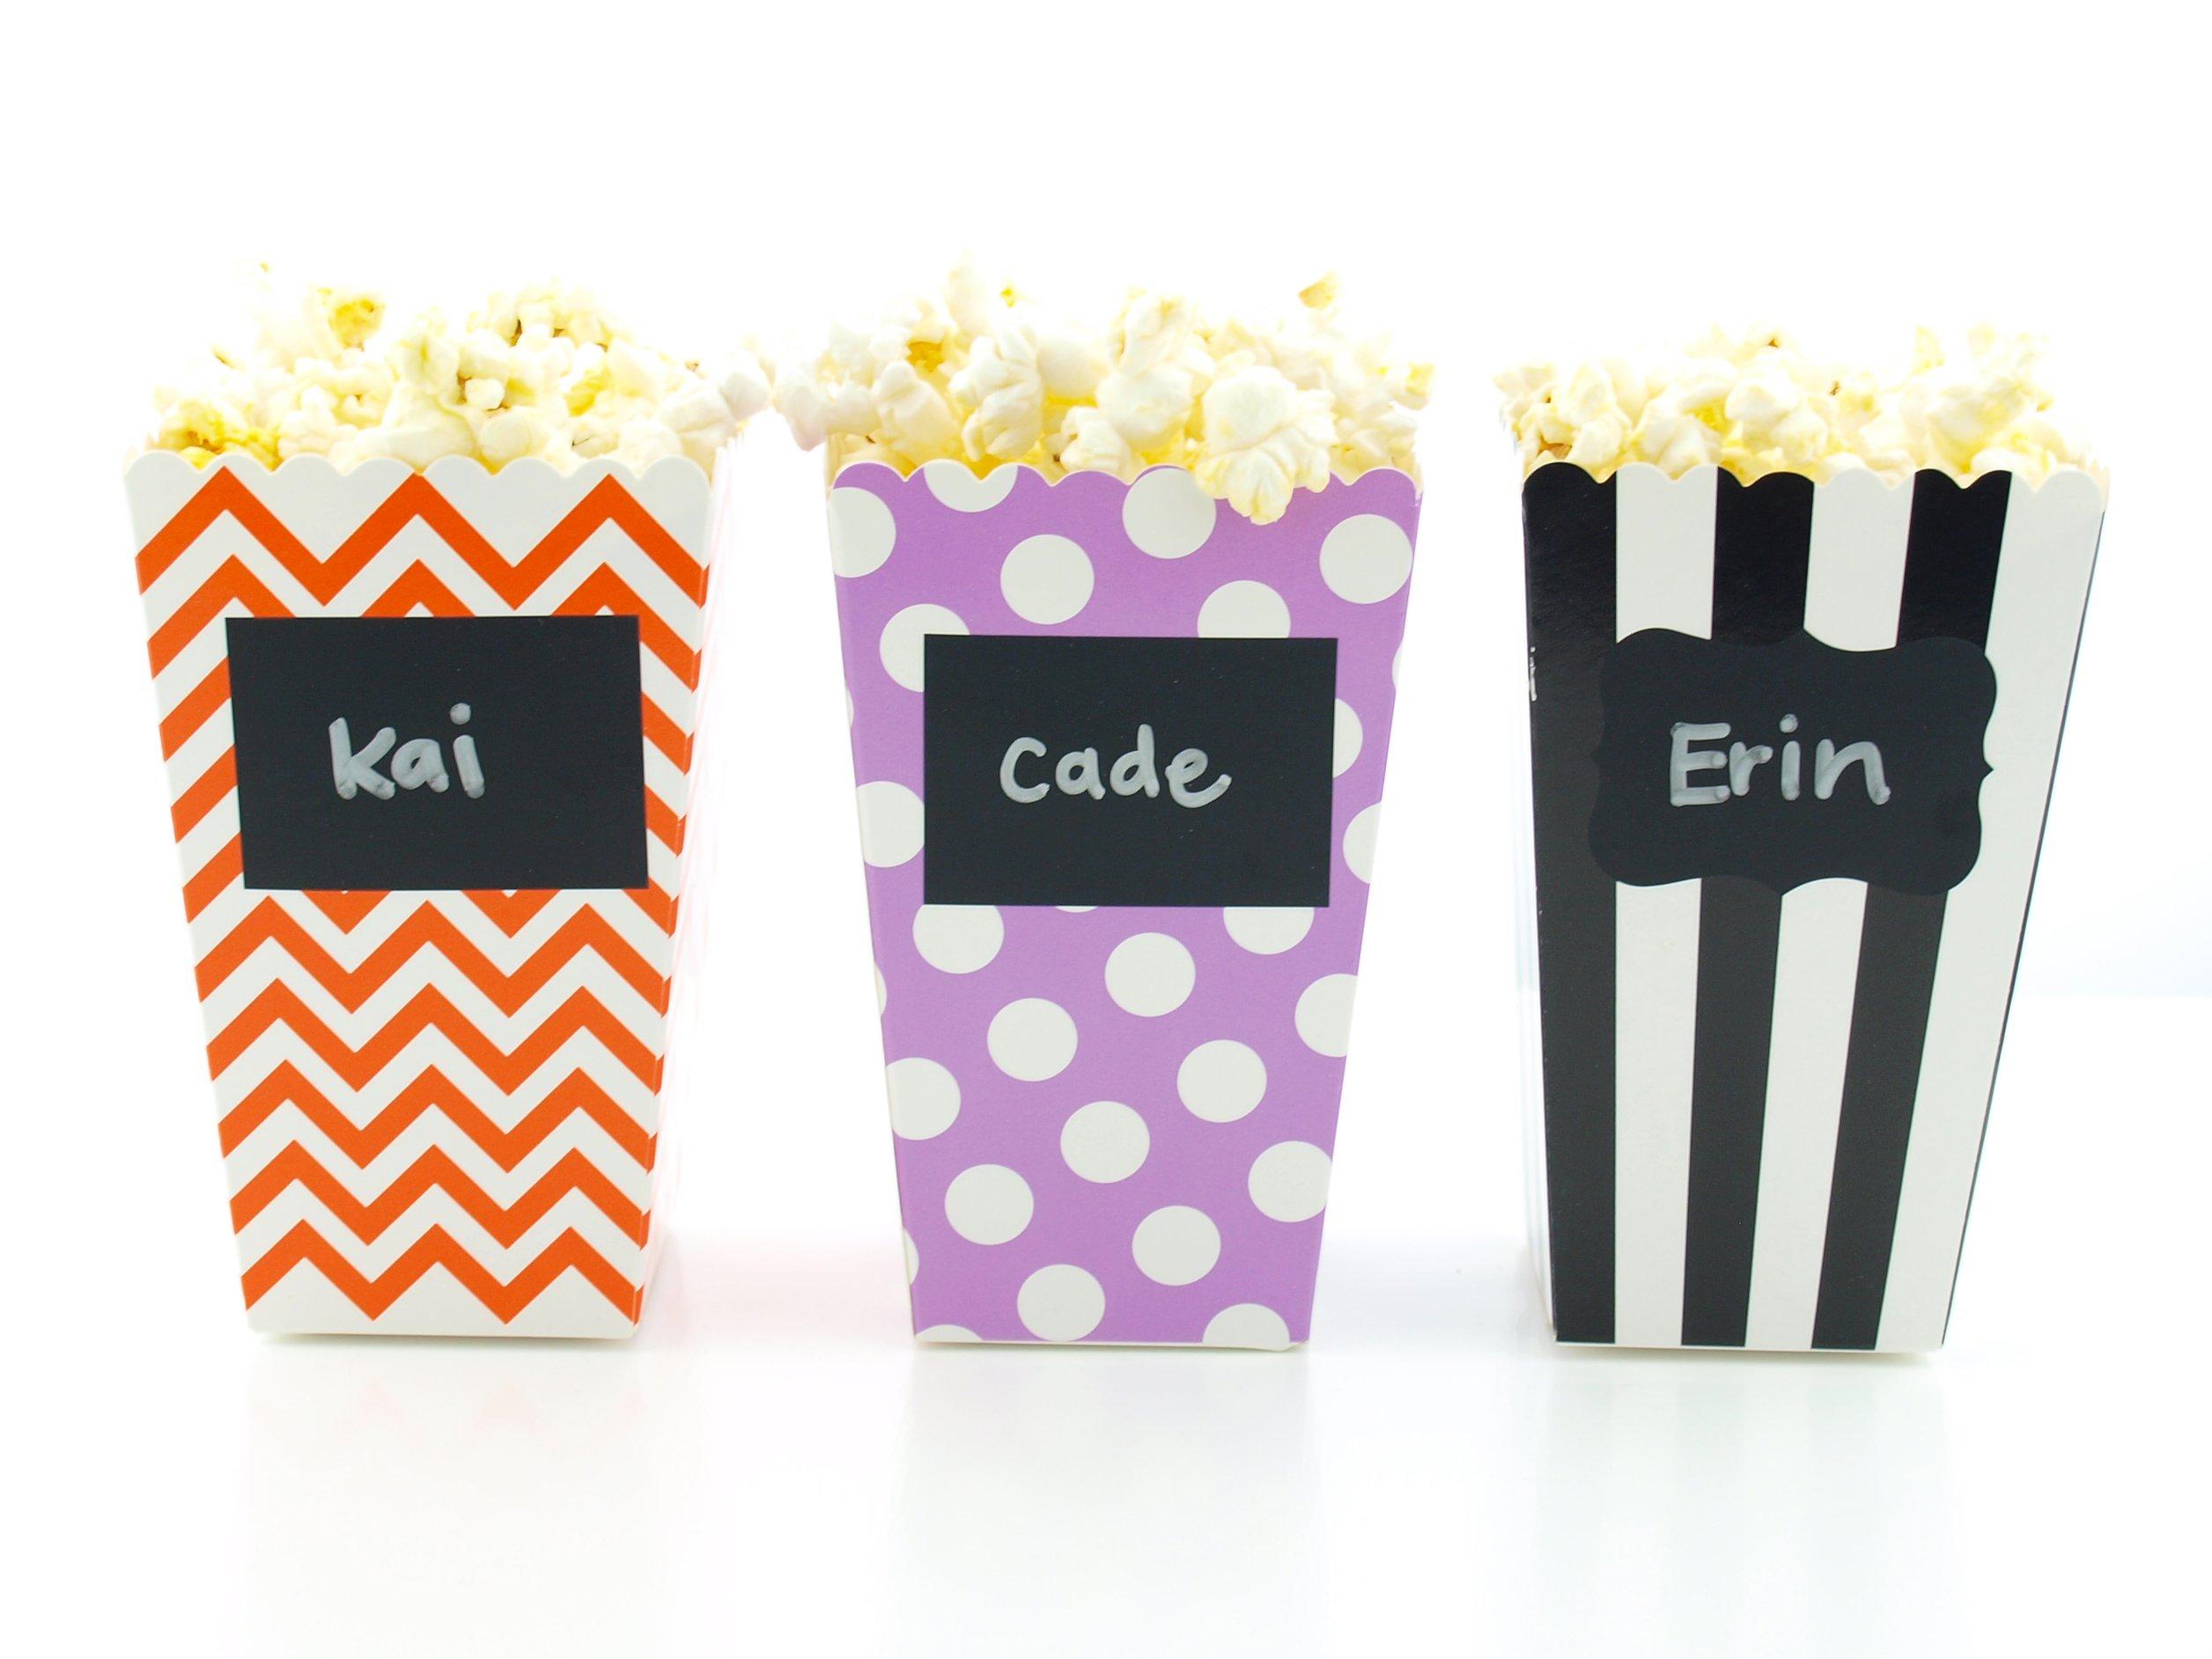 Halloween Candy or Popcorn Boxes & Black Label Chalkboard Vinyl Stickers (36 Pack) - Modern Black, Orange & Purple Halloween Favors, Mini Movie Theater Tub Popcorn Halloween Boxes